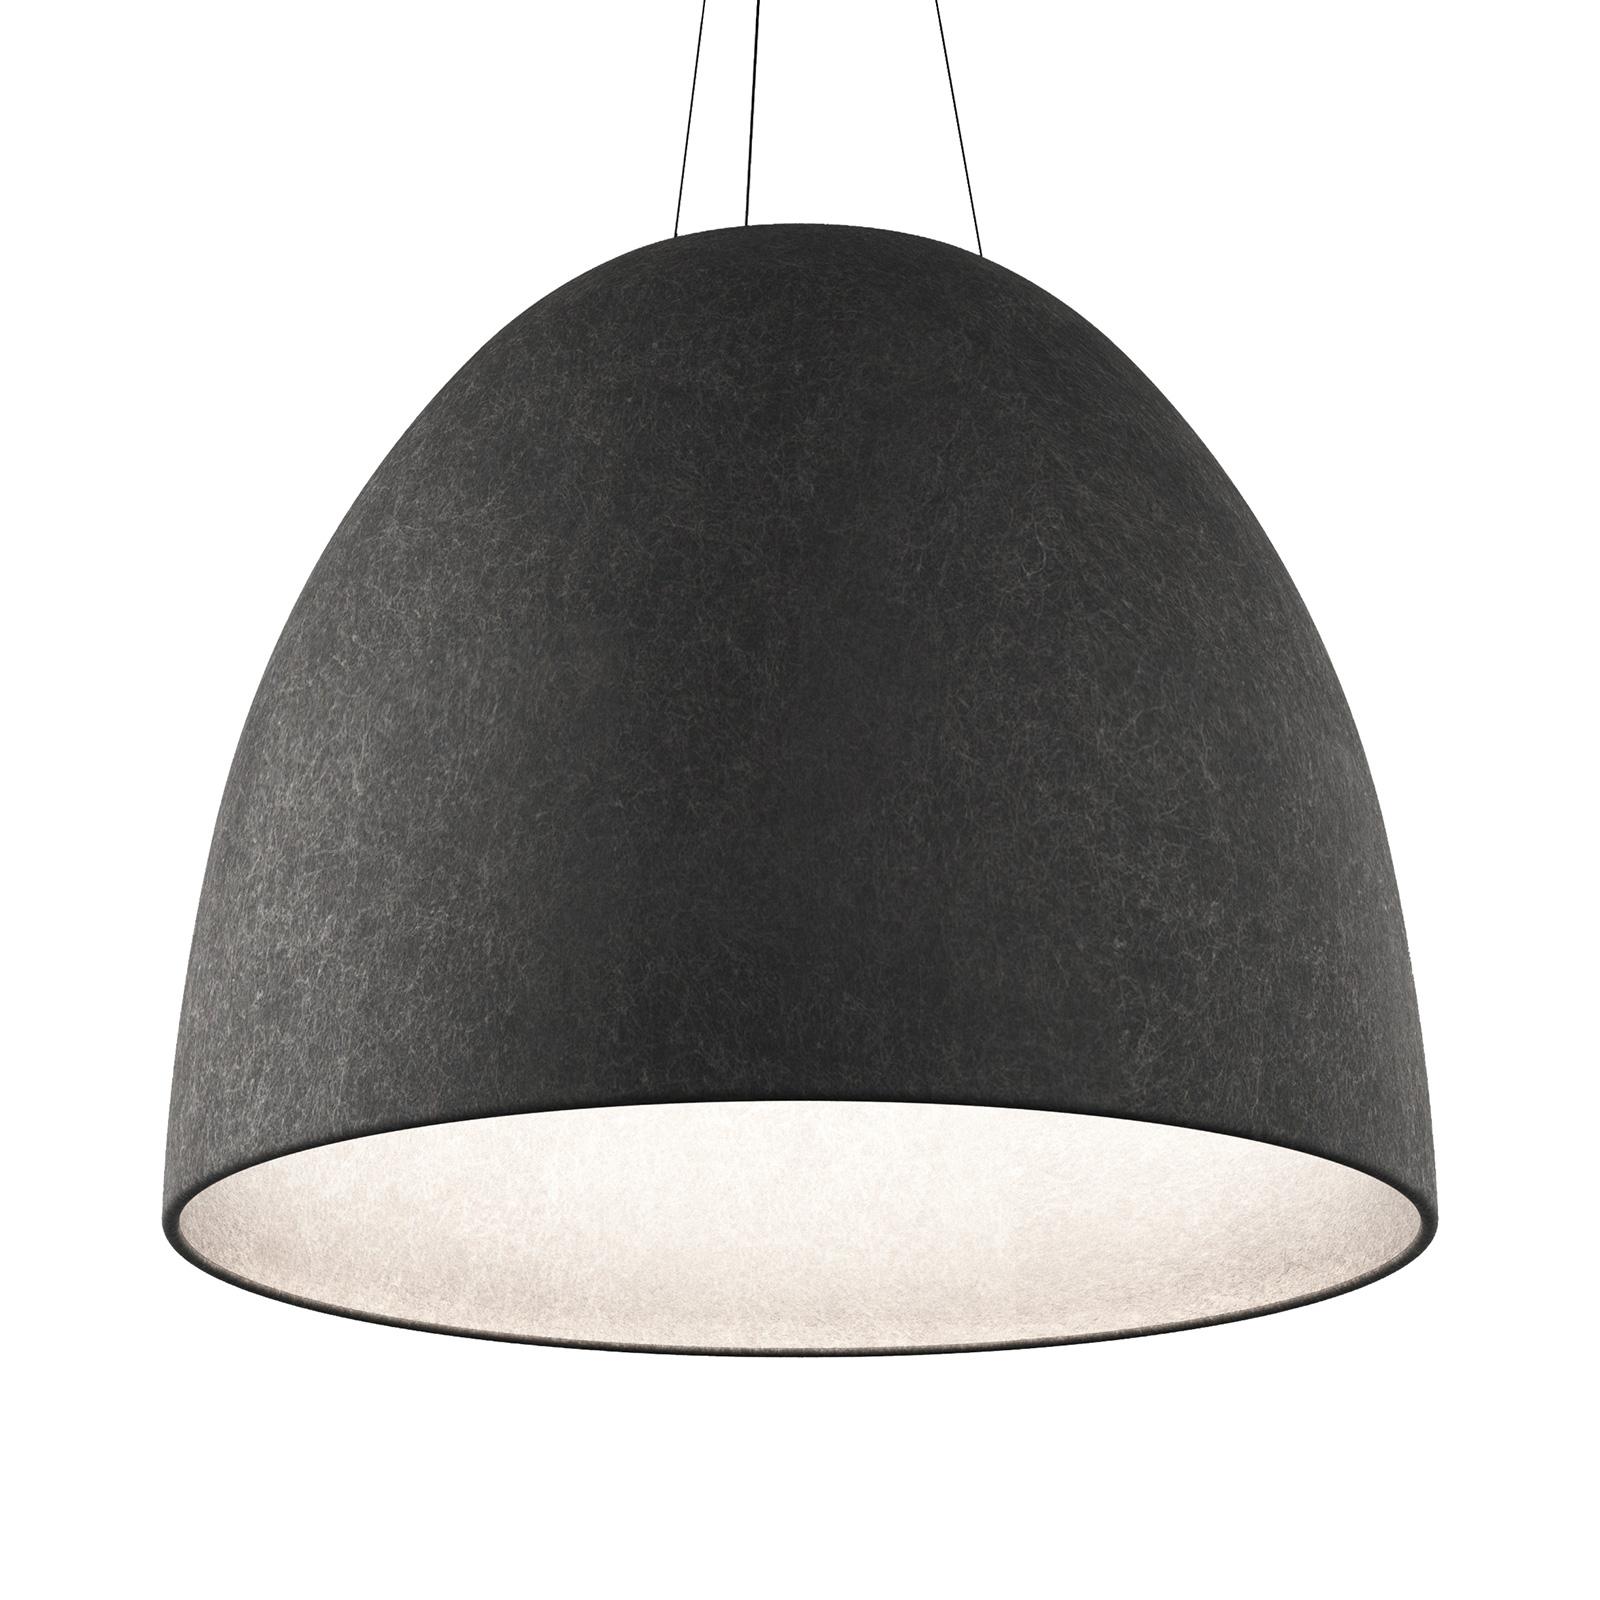 Artemide Nur Acoustic lampa wisząca LED szara